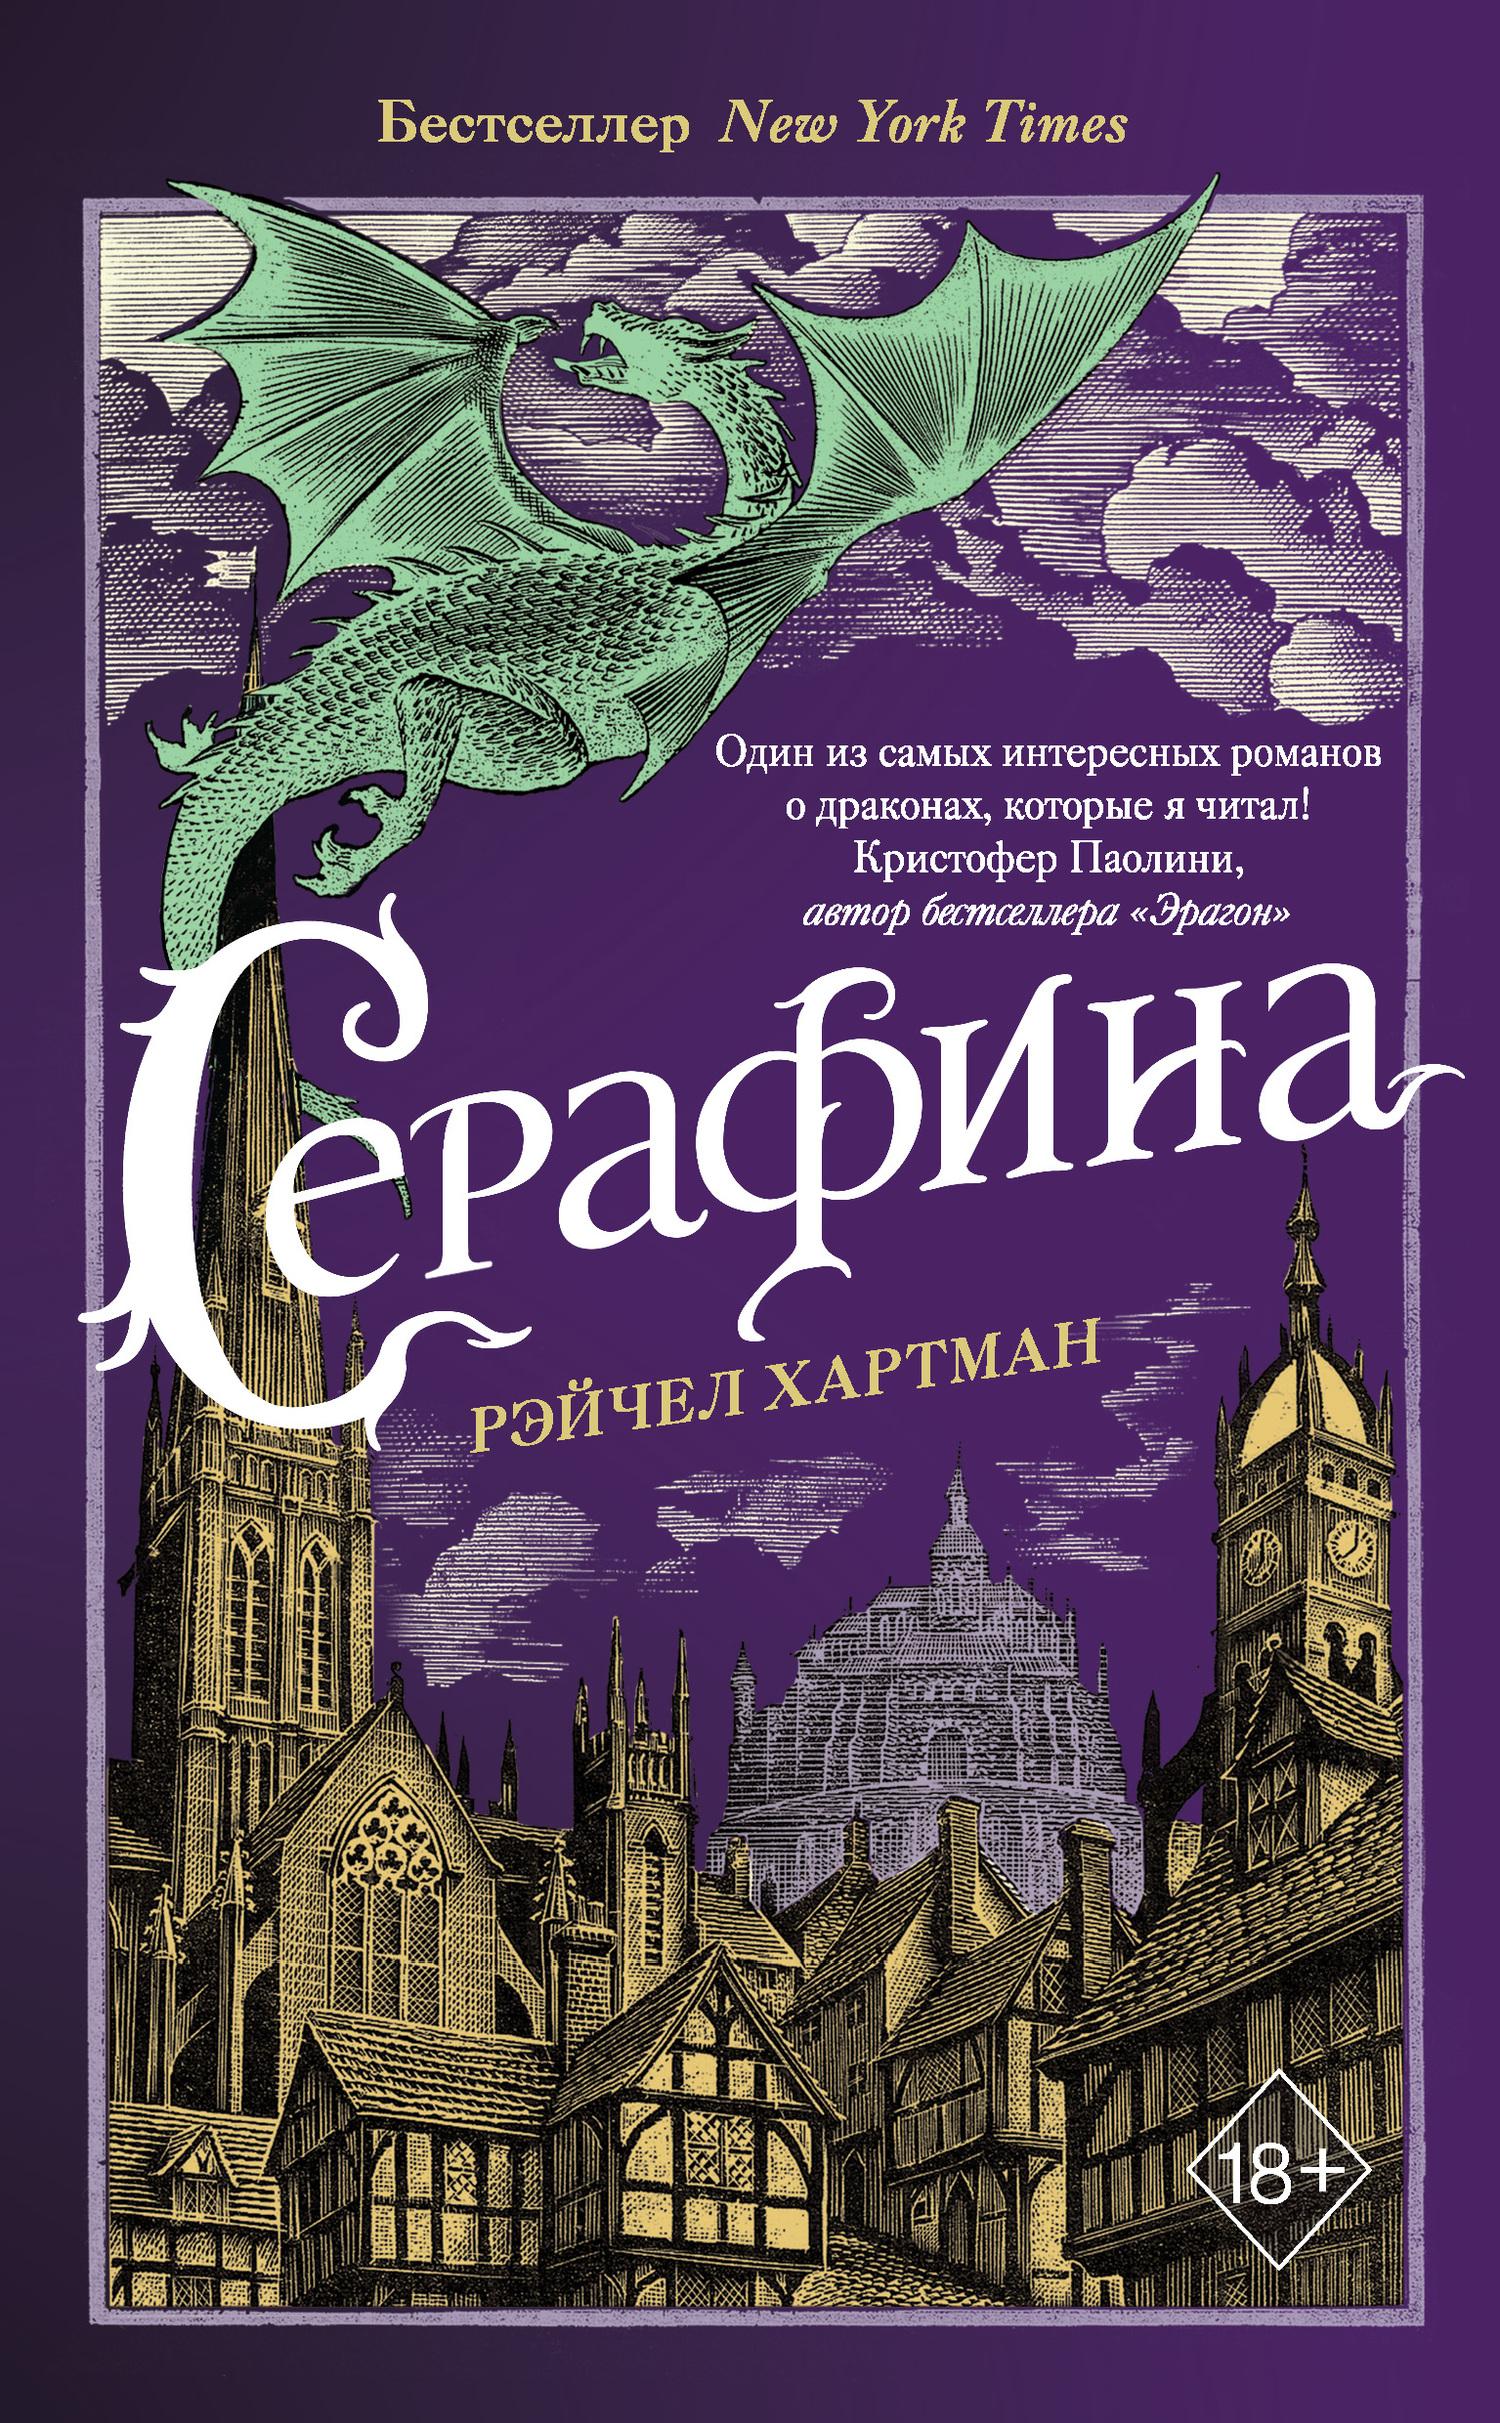 Серафина (перевод Сибуль Елена)